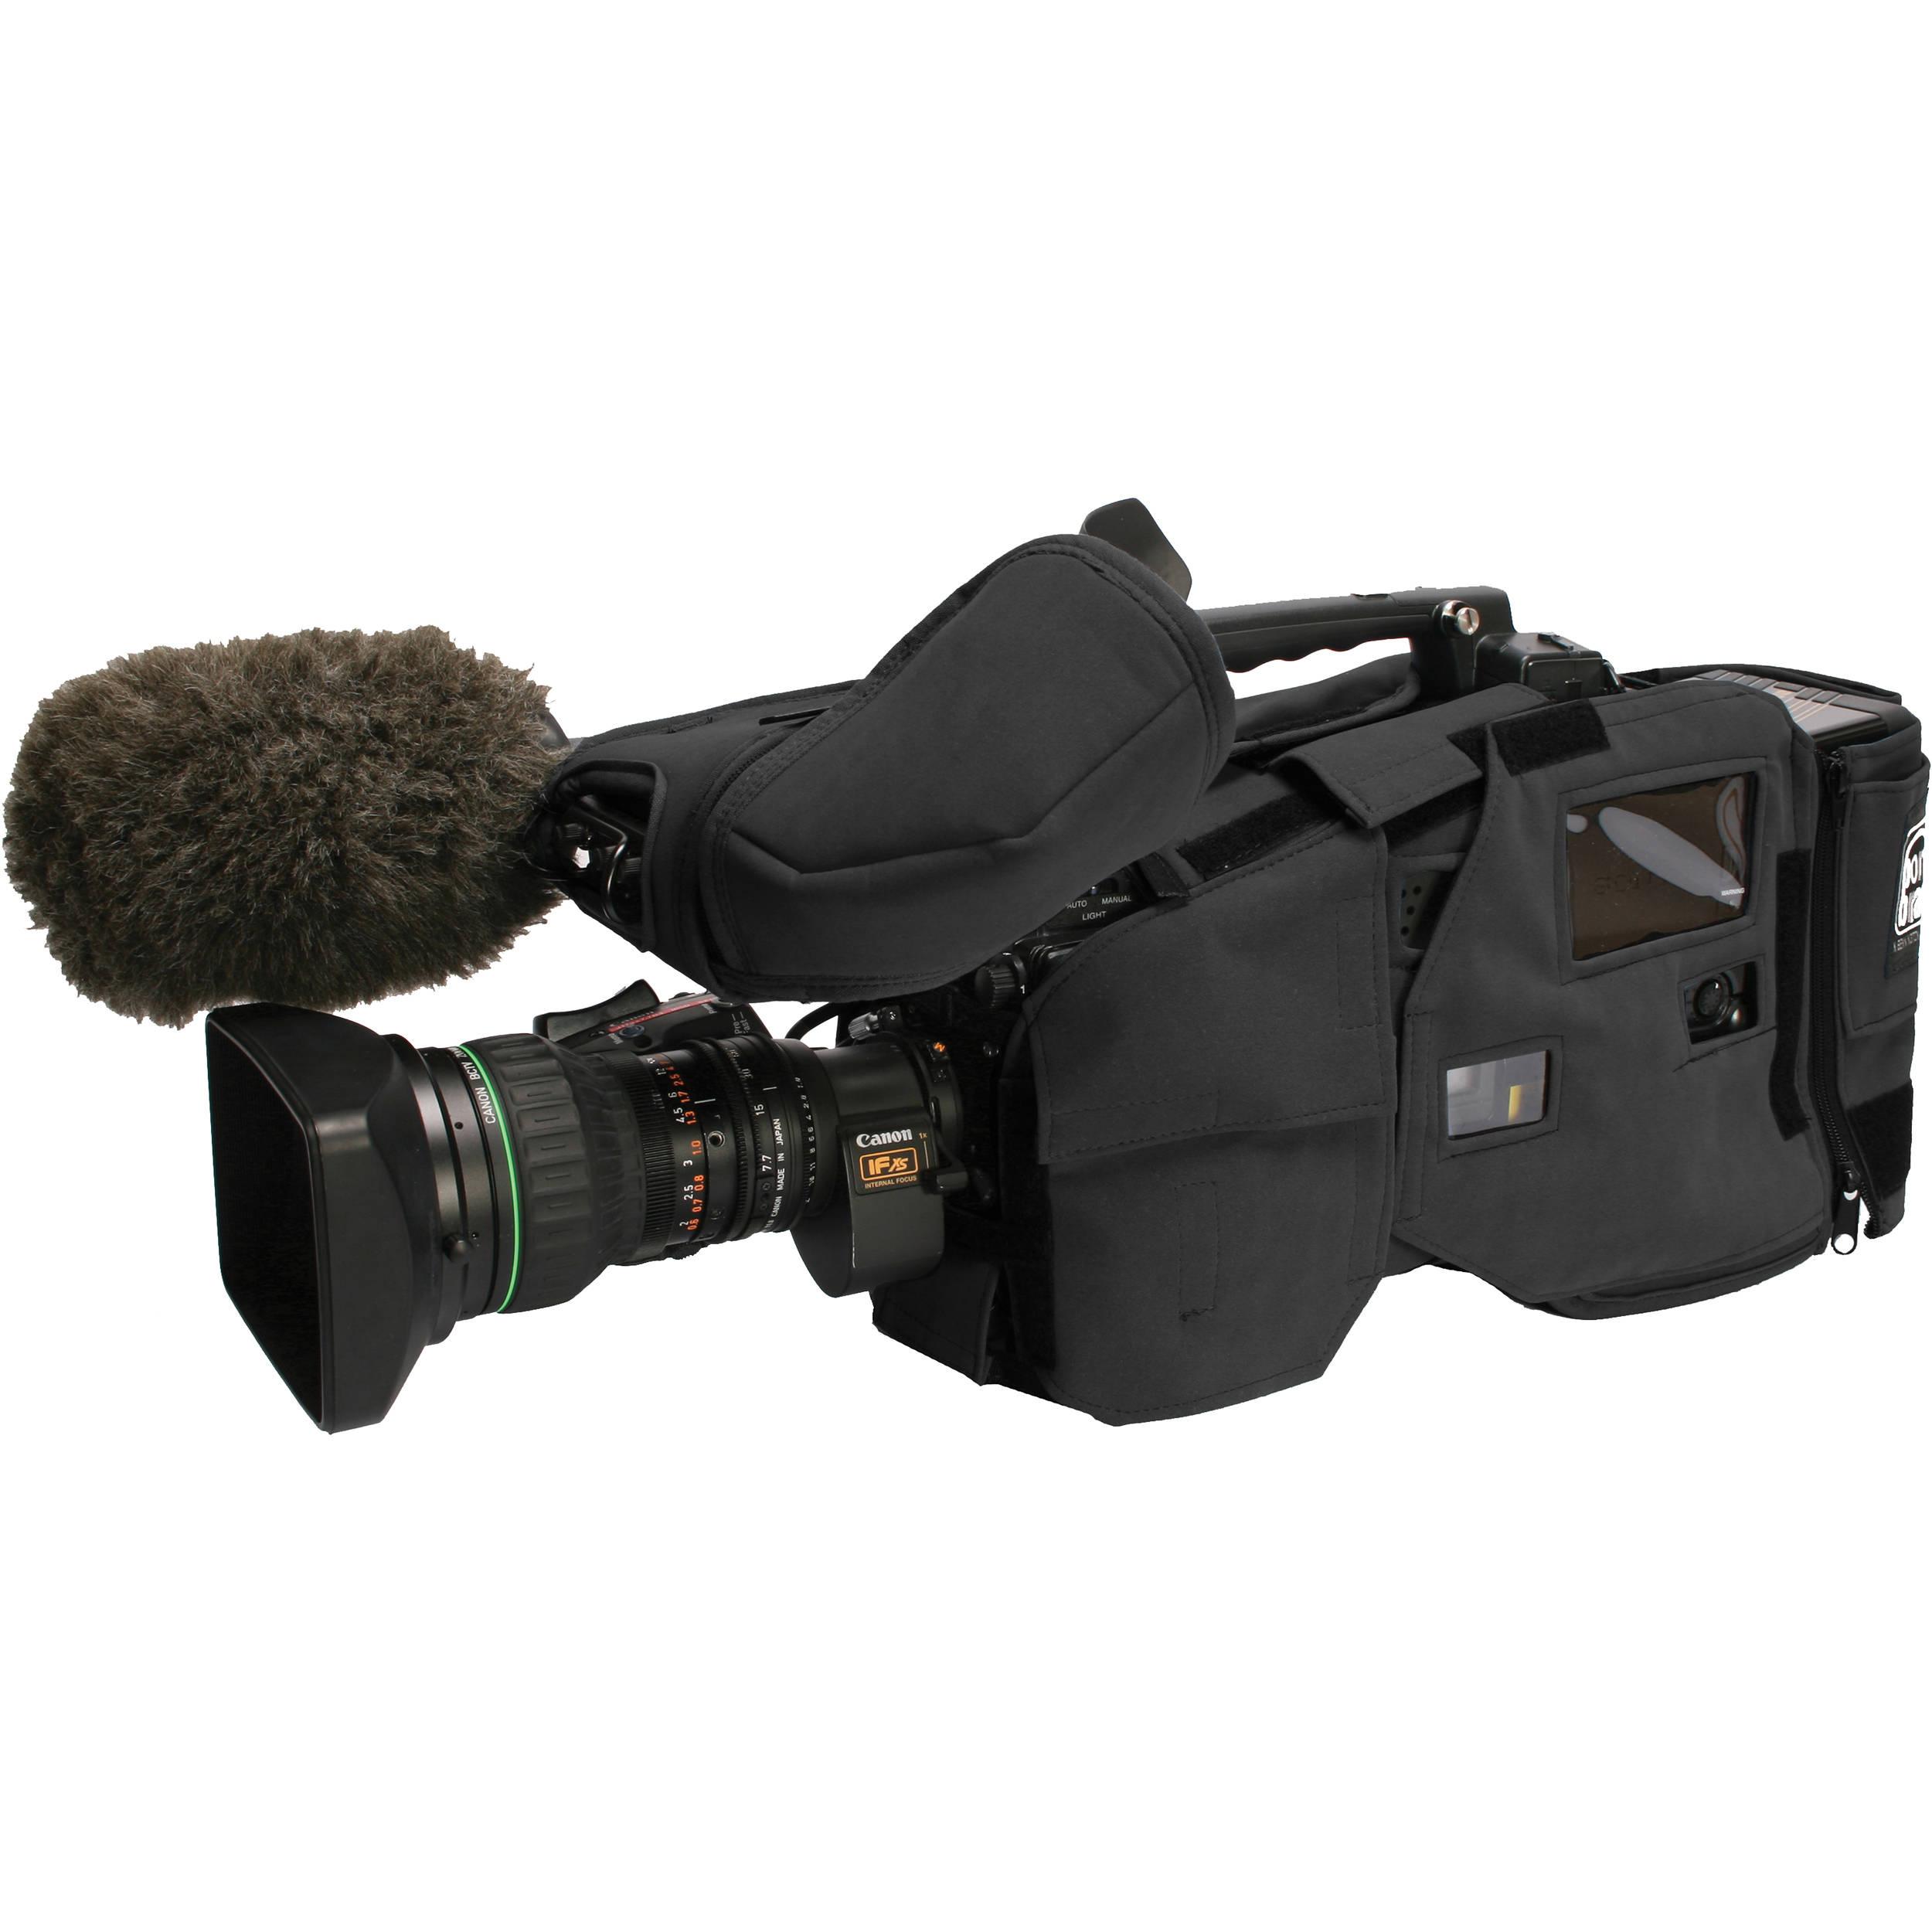 Porta Brace Camera Body Armor Case for Sony Camcorders (Black)